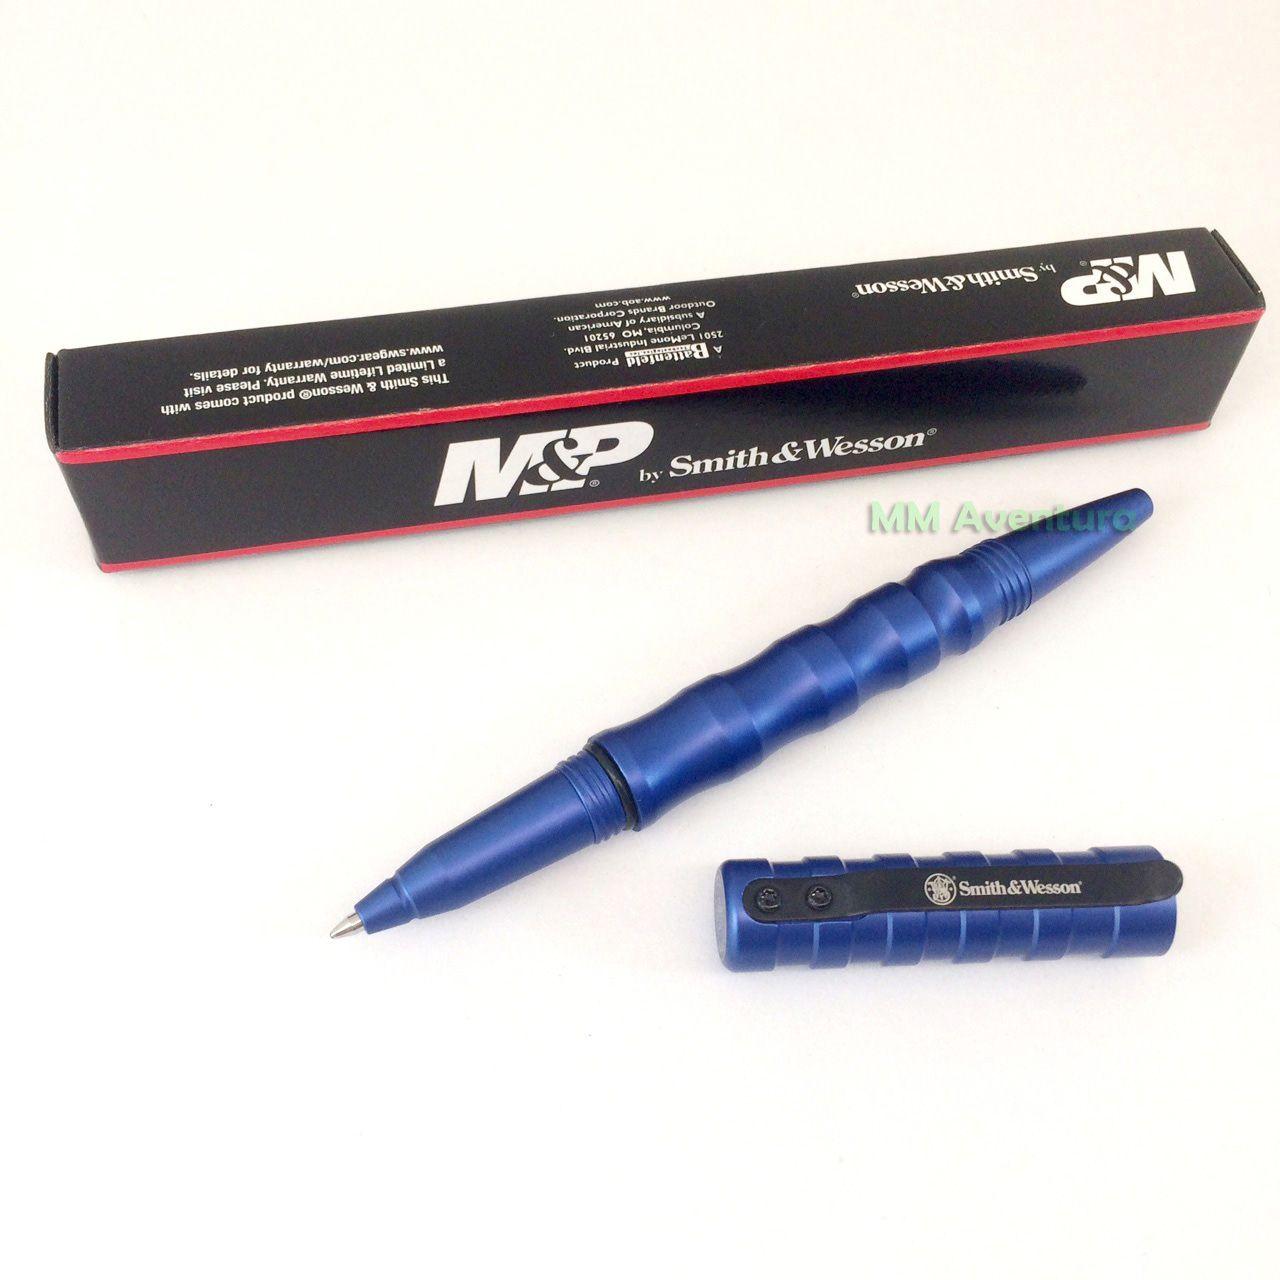 Caneta Smith & Wesson Black Tactical Pen Alumínio Preta Esferográfica p/ Defesa Pessoal